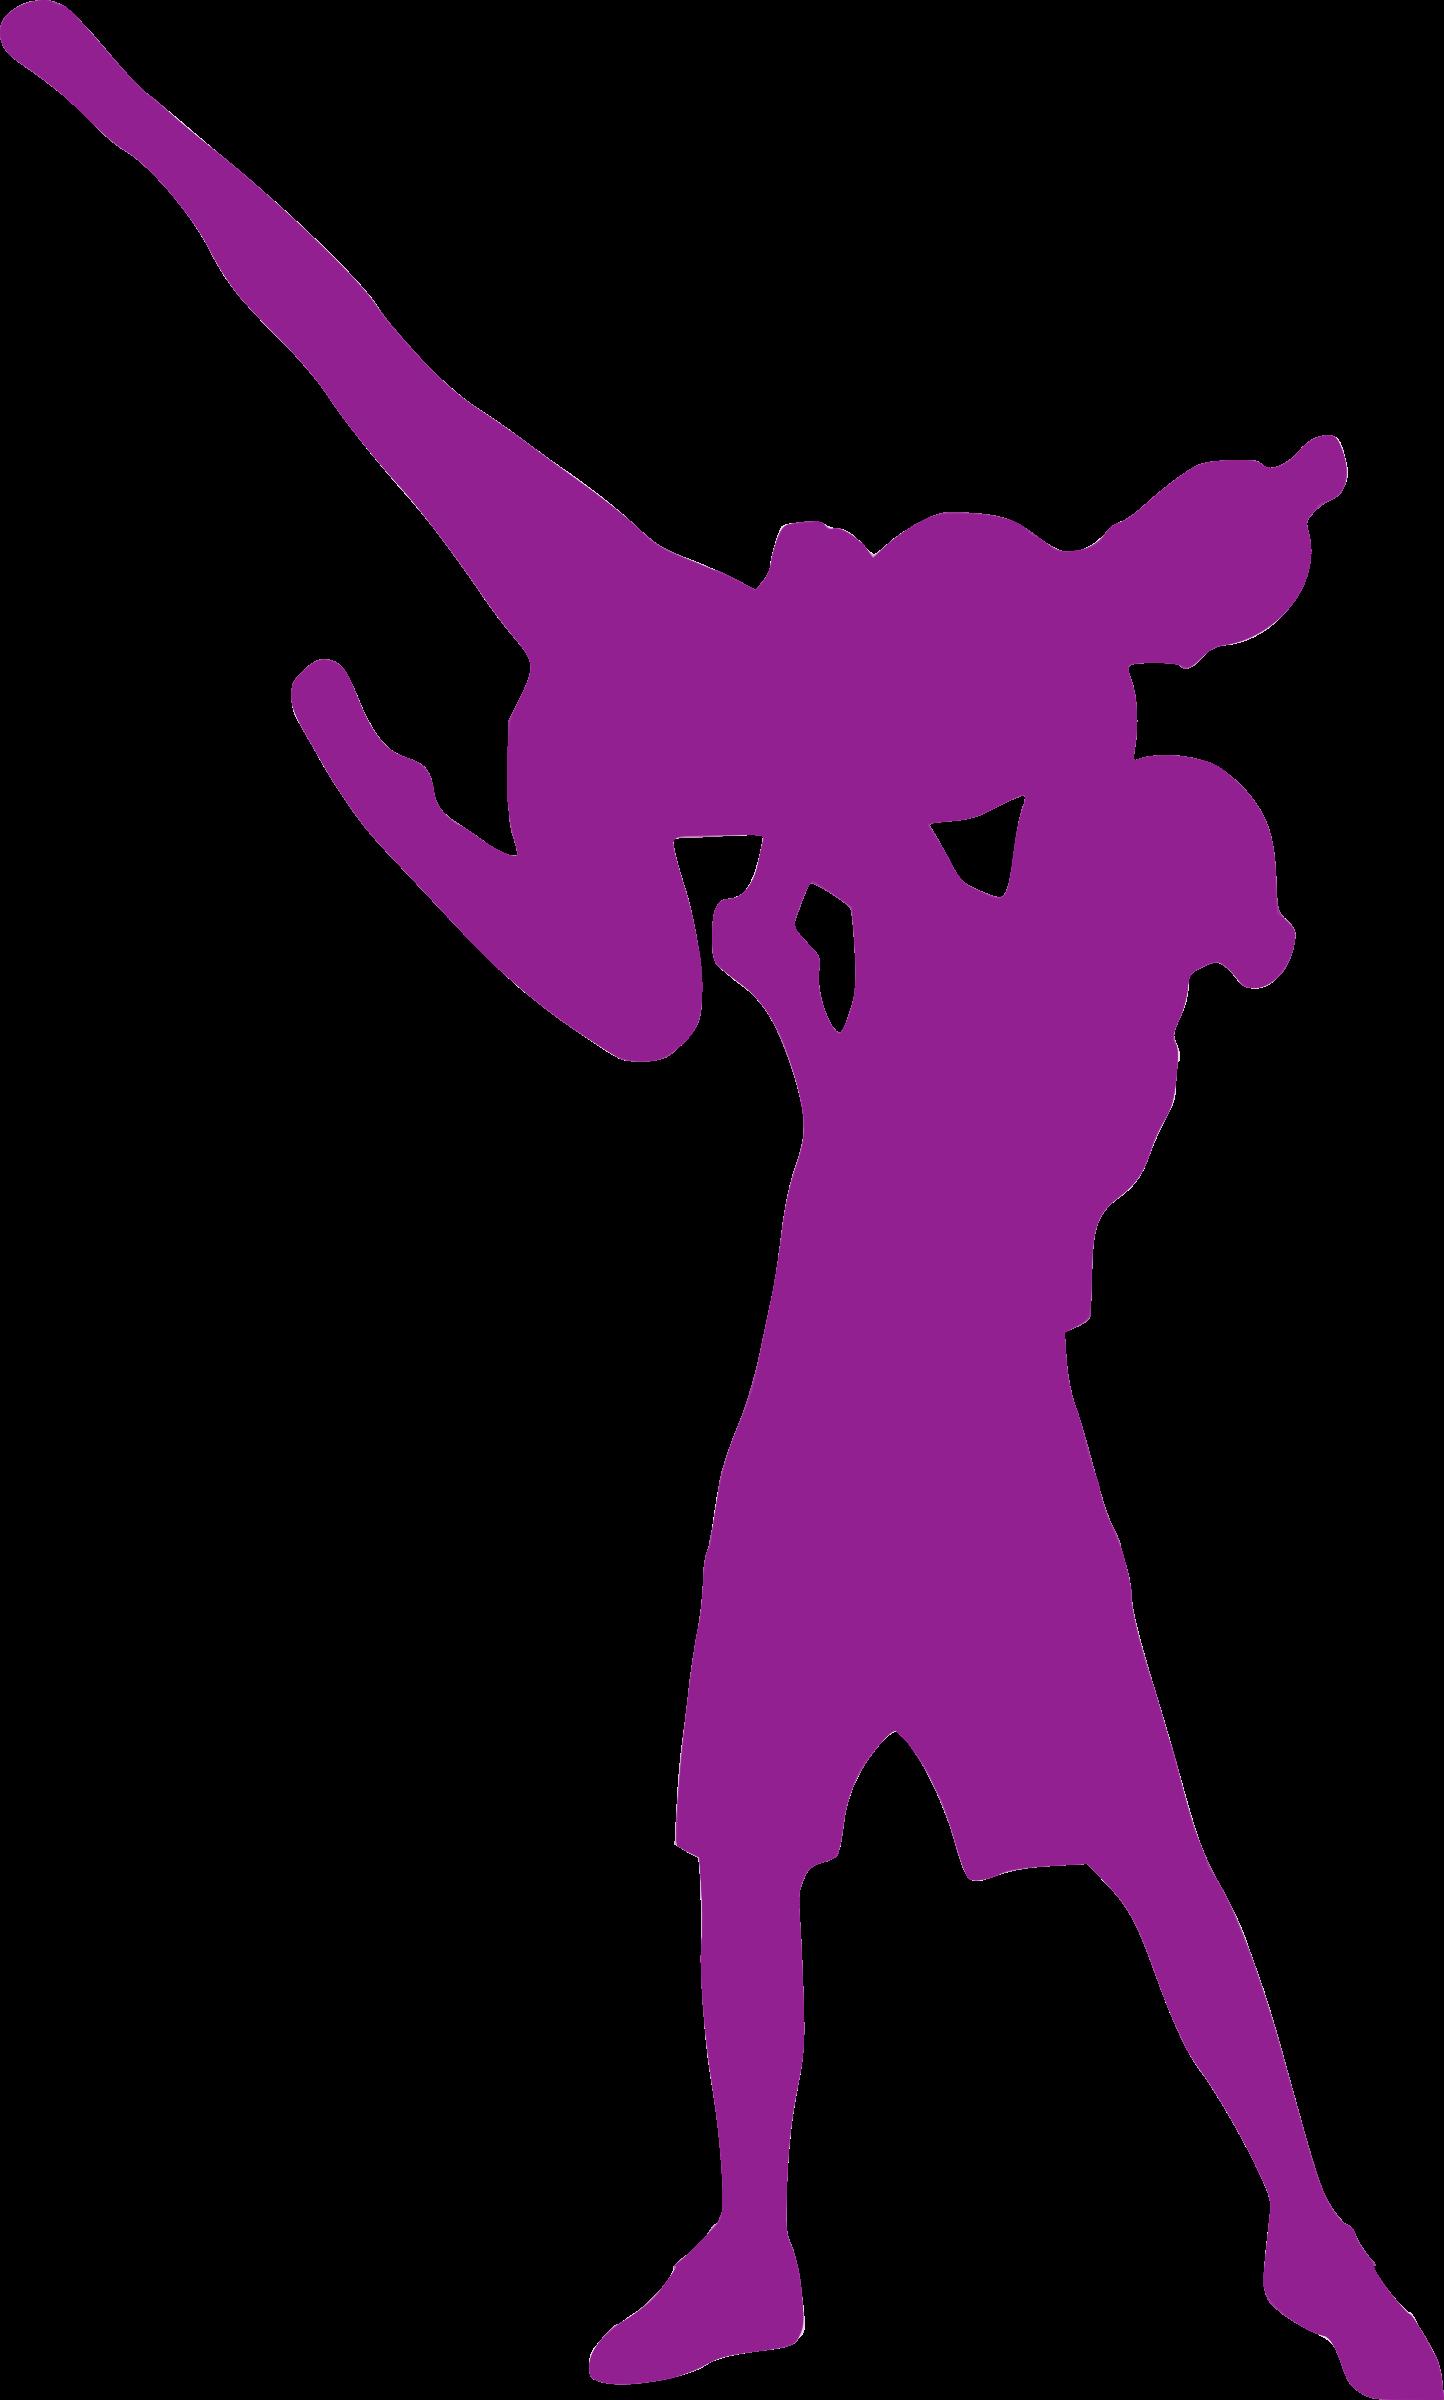 Danse clipart silhouette Silhouette Silhouette Danse Clipart 17